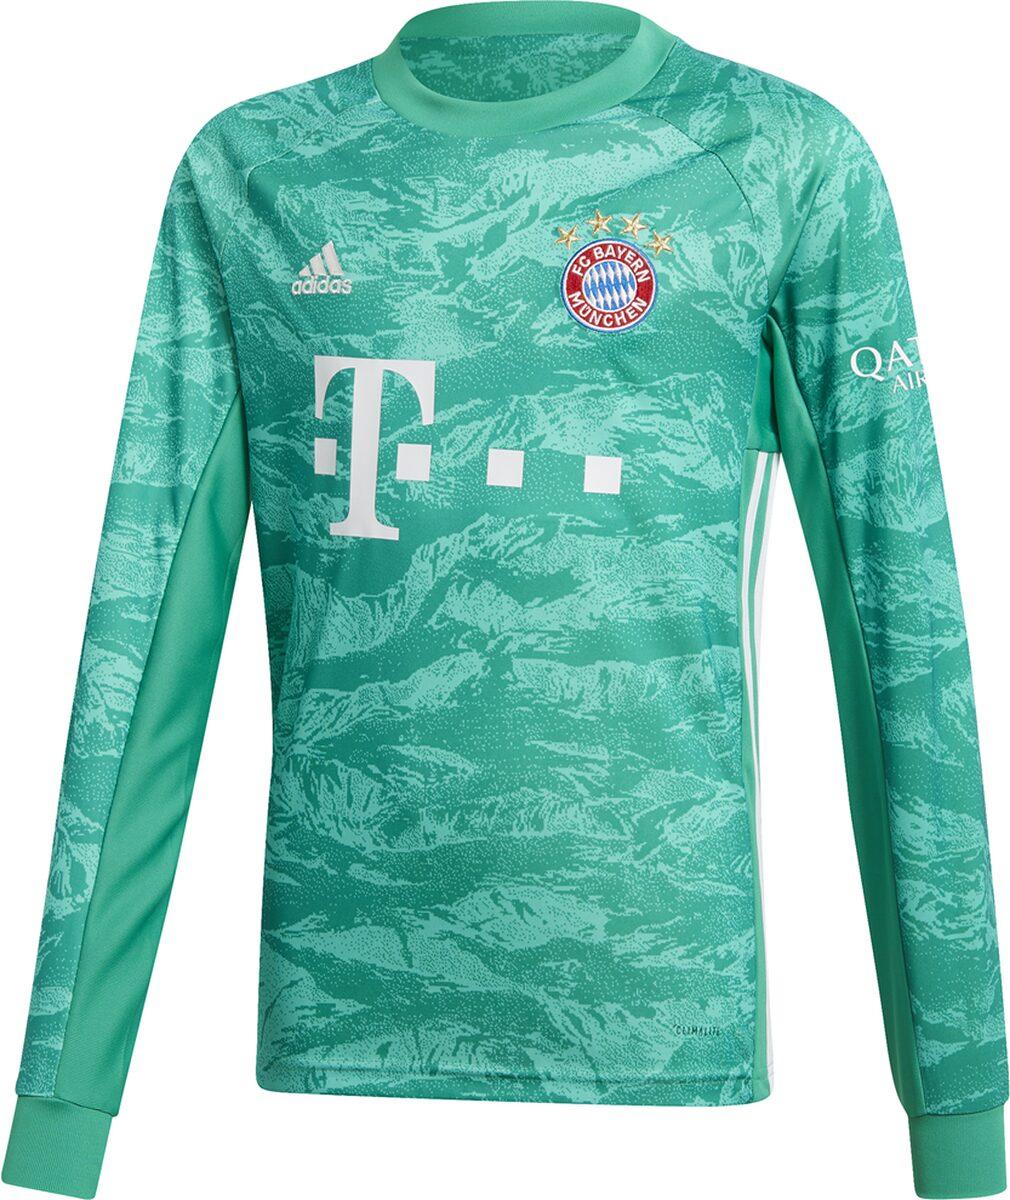 Torwarttrikot Bayern München